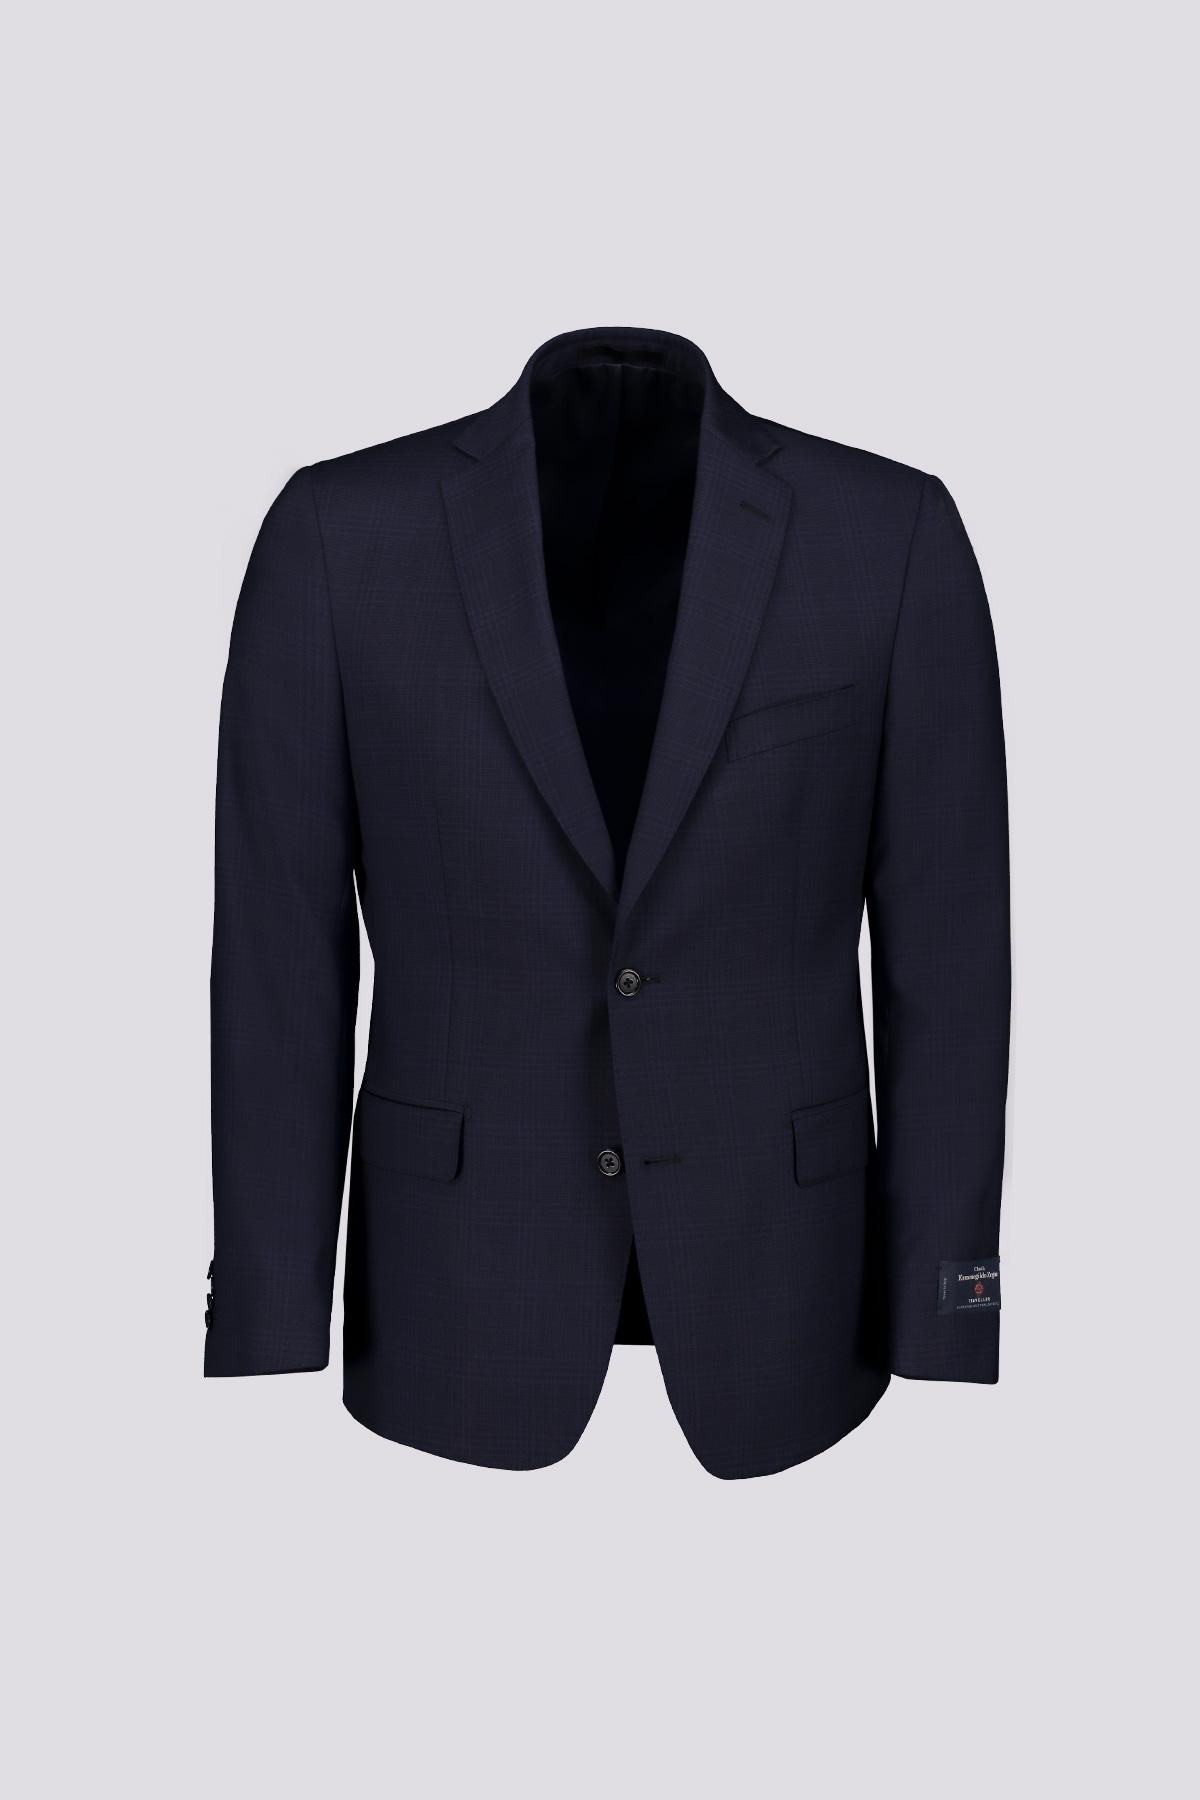 Traje Recto marca Cloth Ermenegildo Zegna azul con cuadro ventana